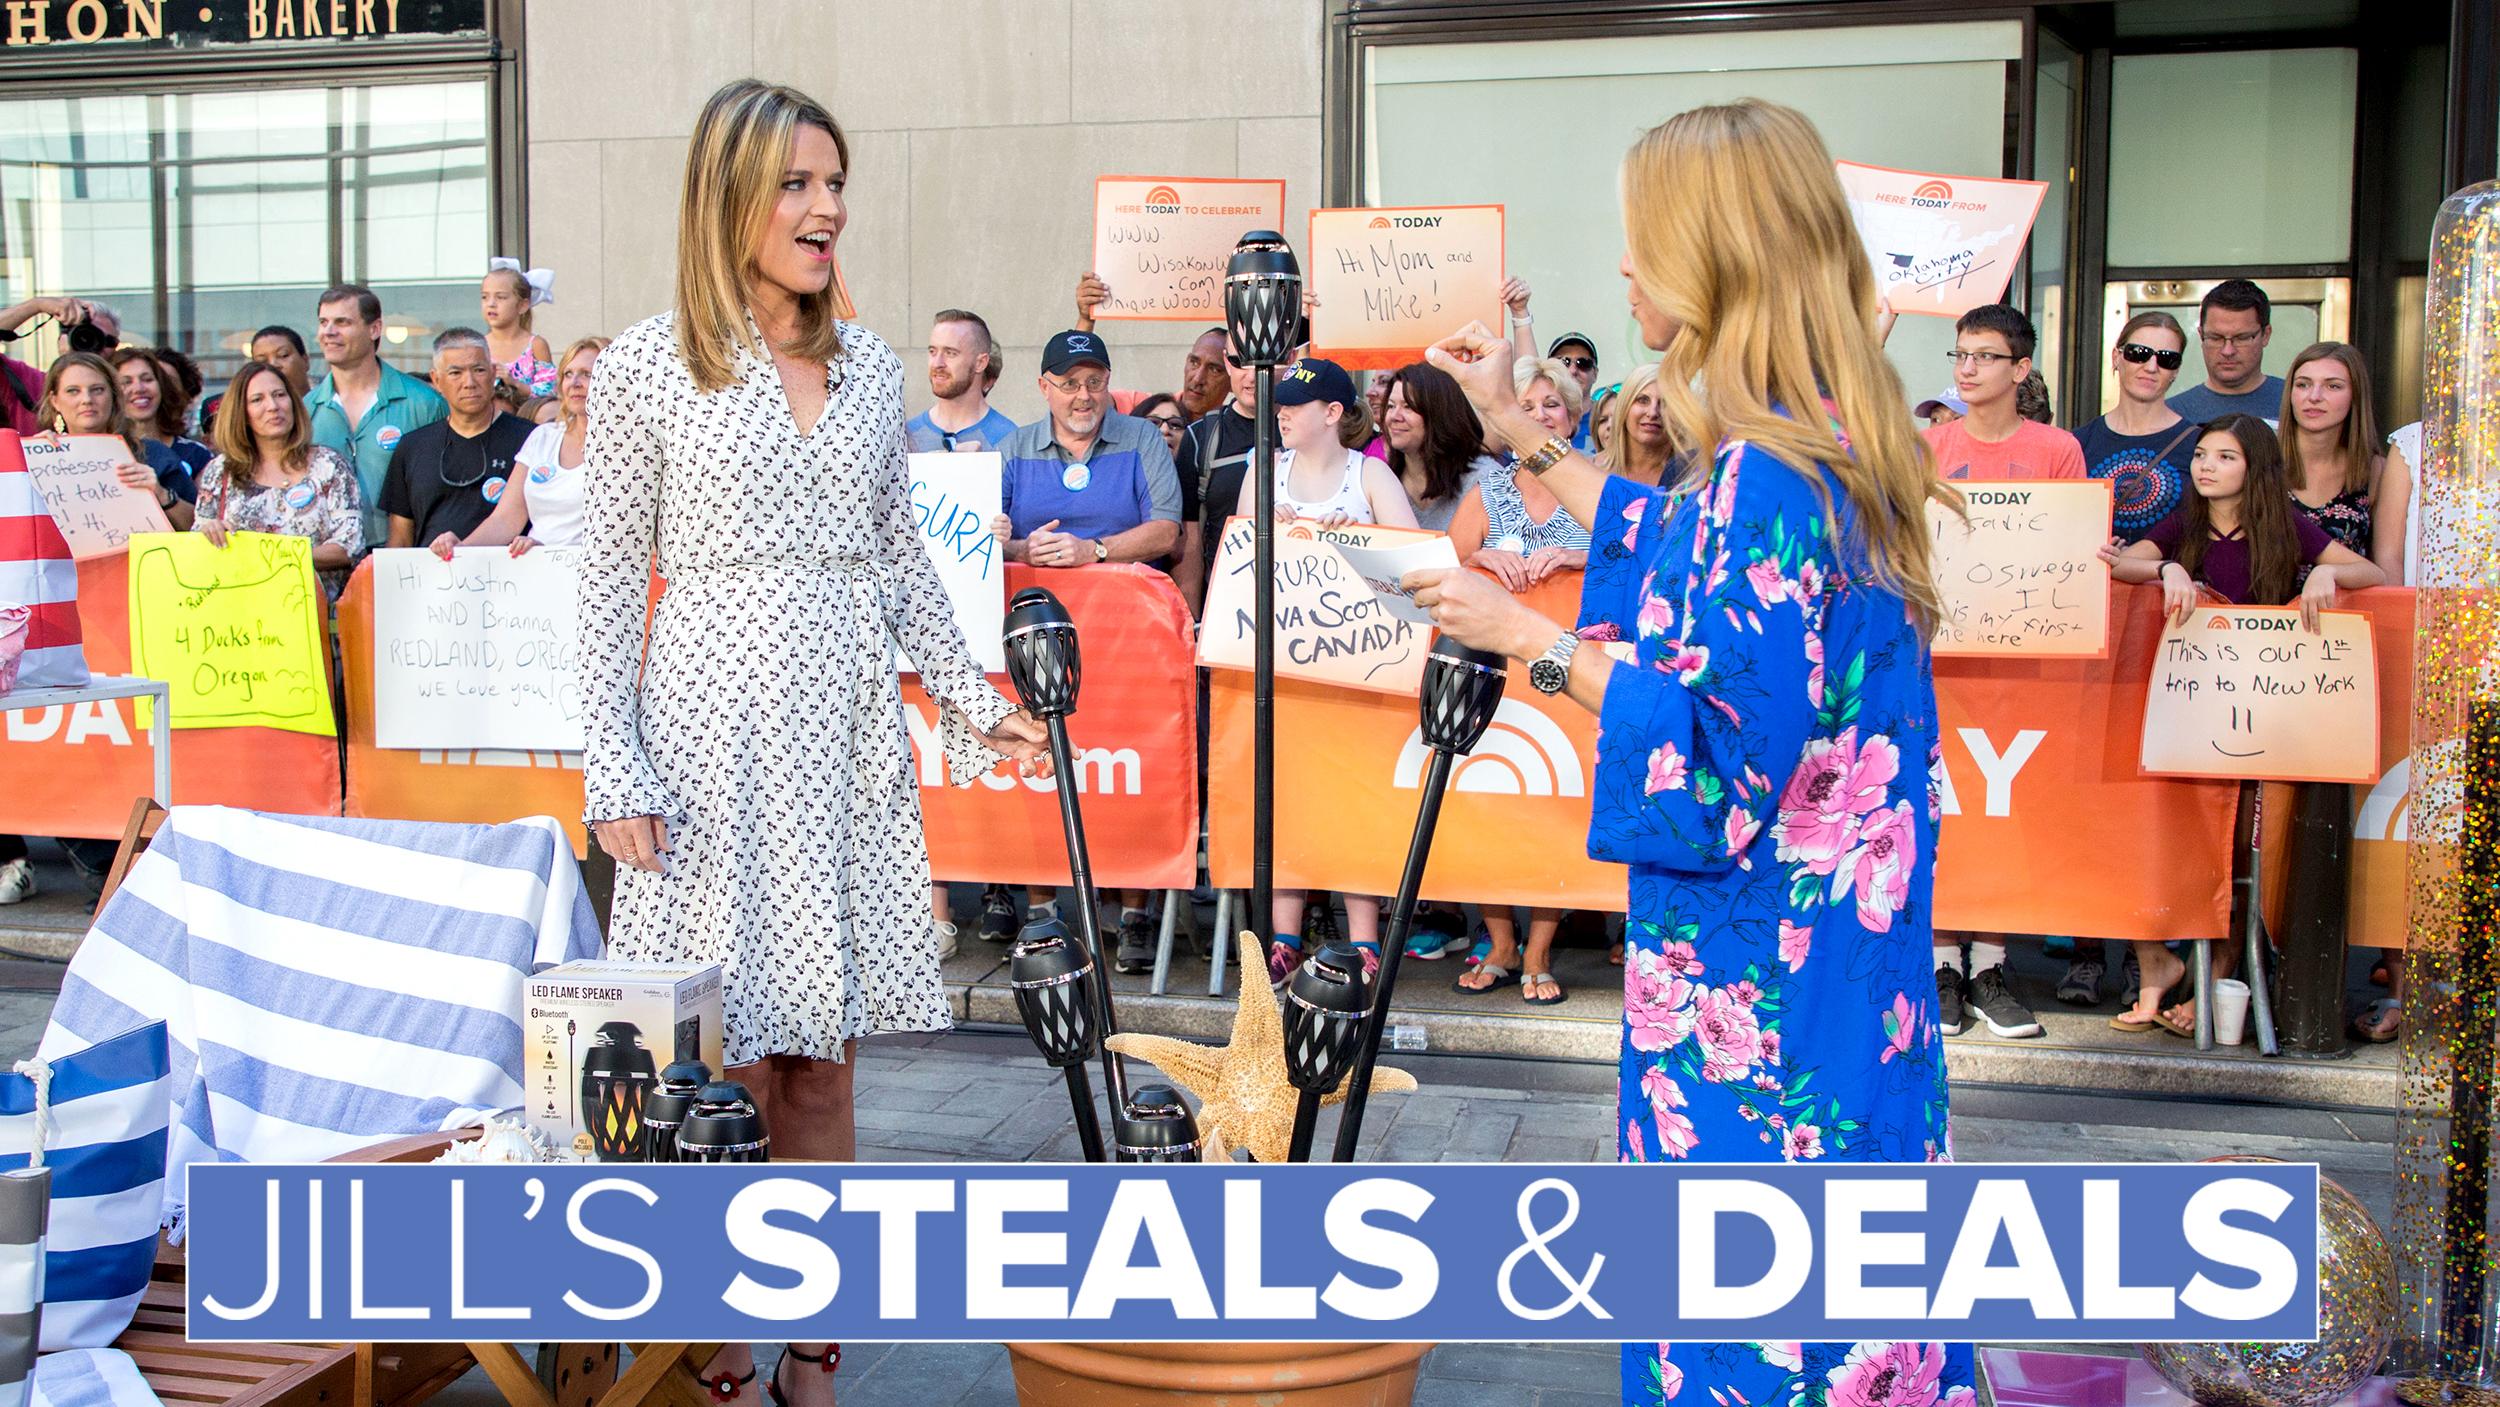 Steals And Deals Summer Books Portable Speaker Water Bottles Beach Towel